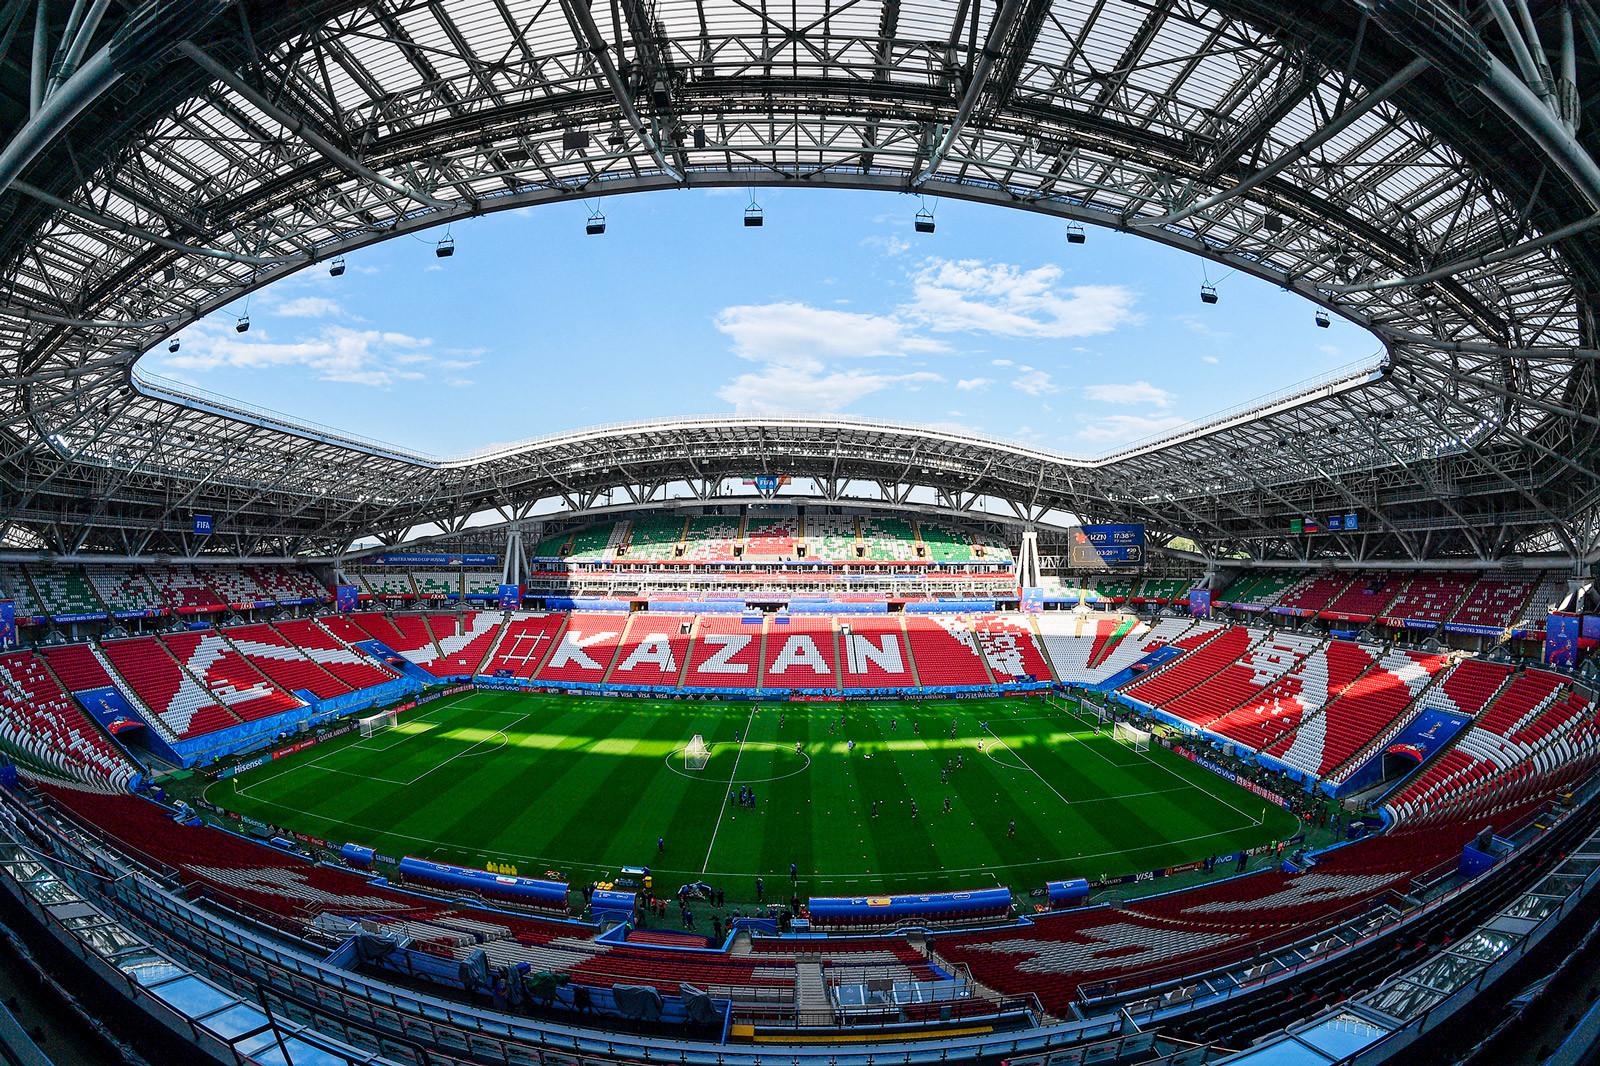 Картинки стадиона казань